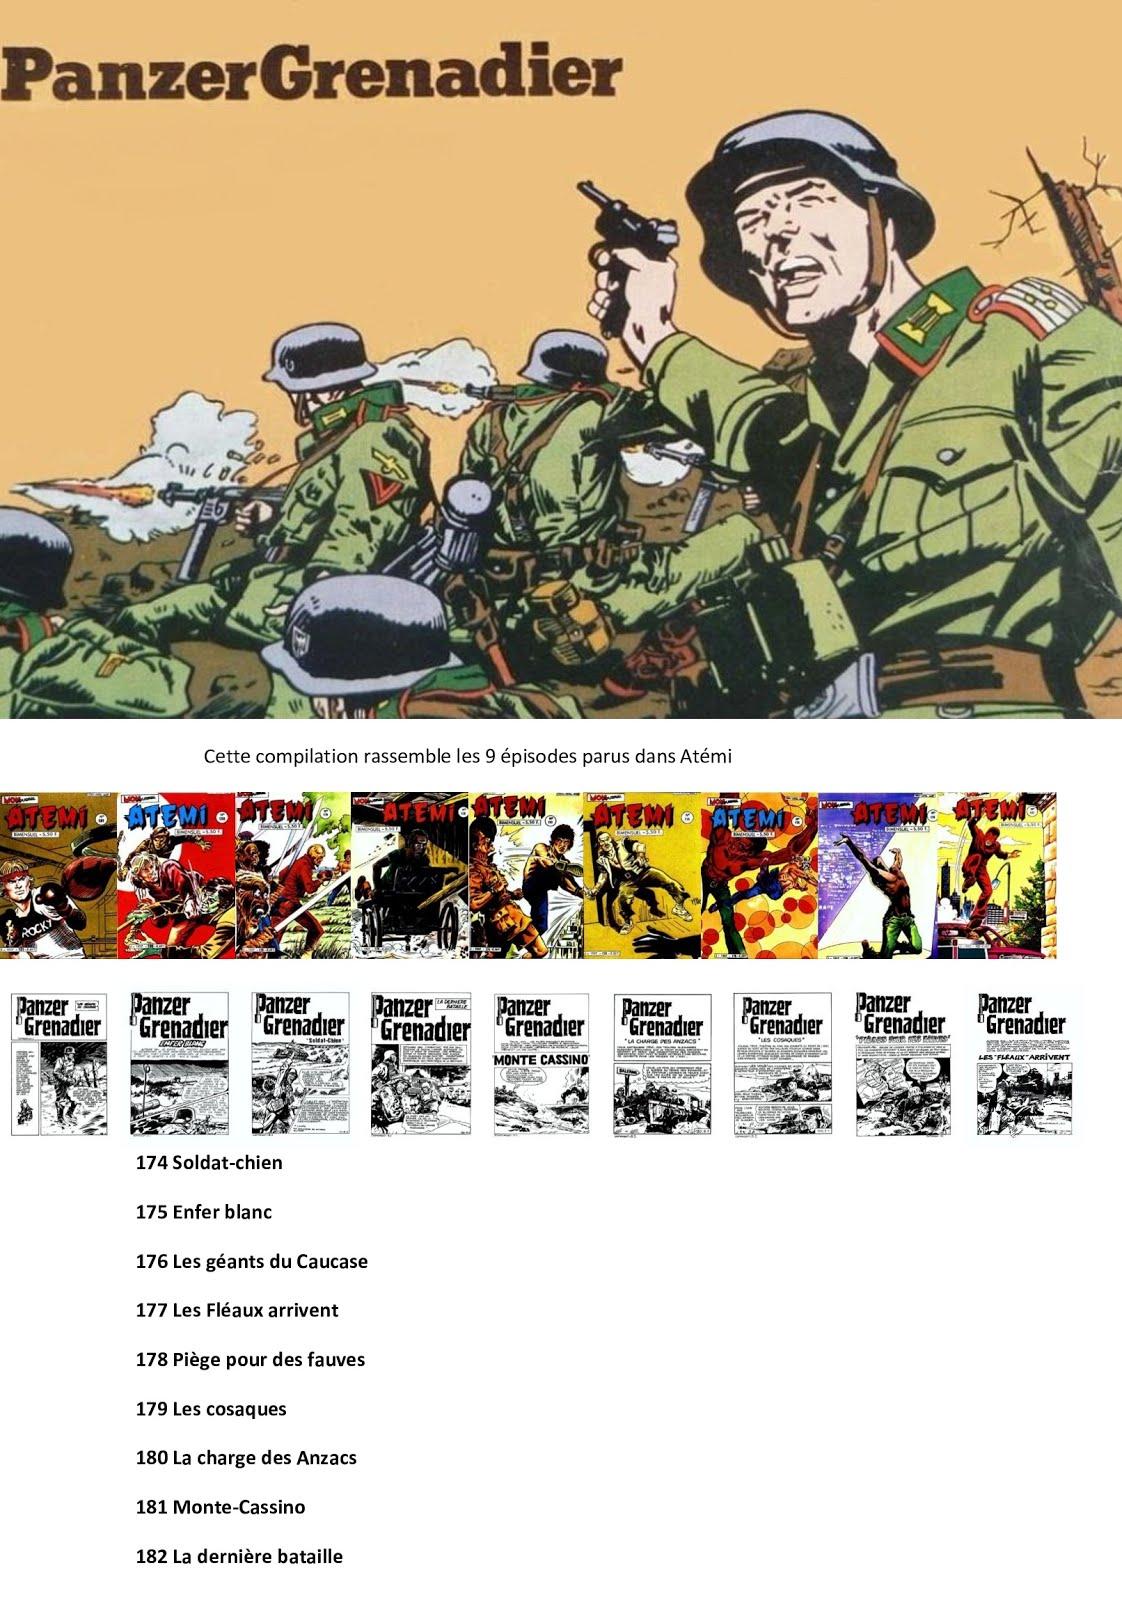 Panzer Grenadier dans Atemi (1984)- Compilation de Zapman